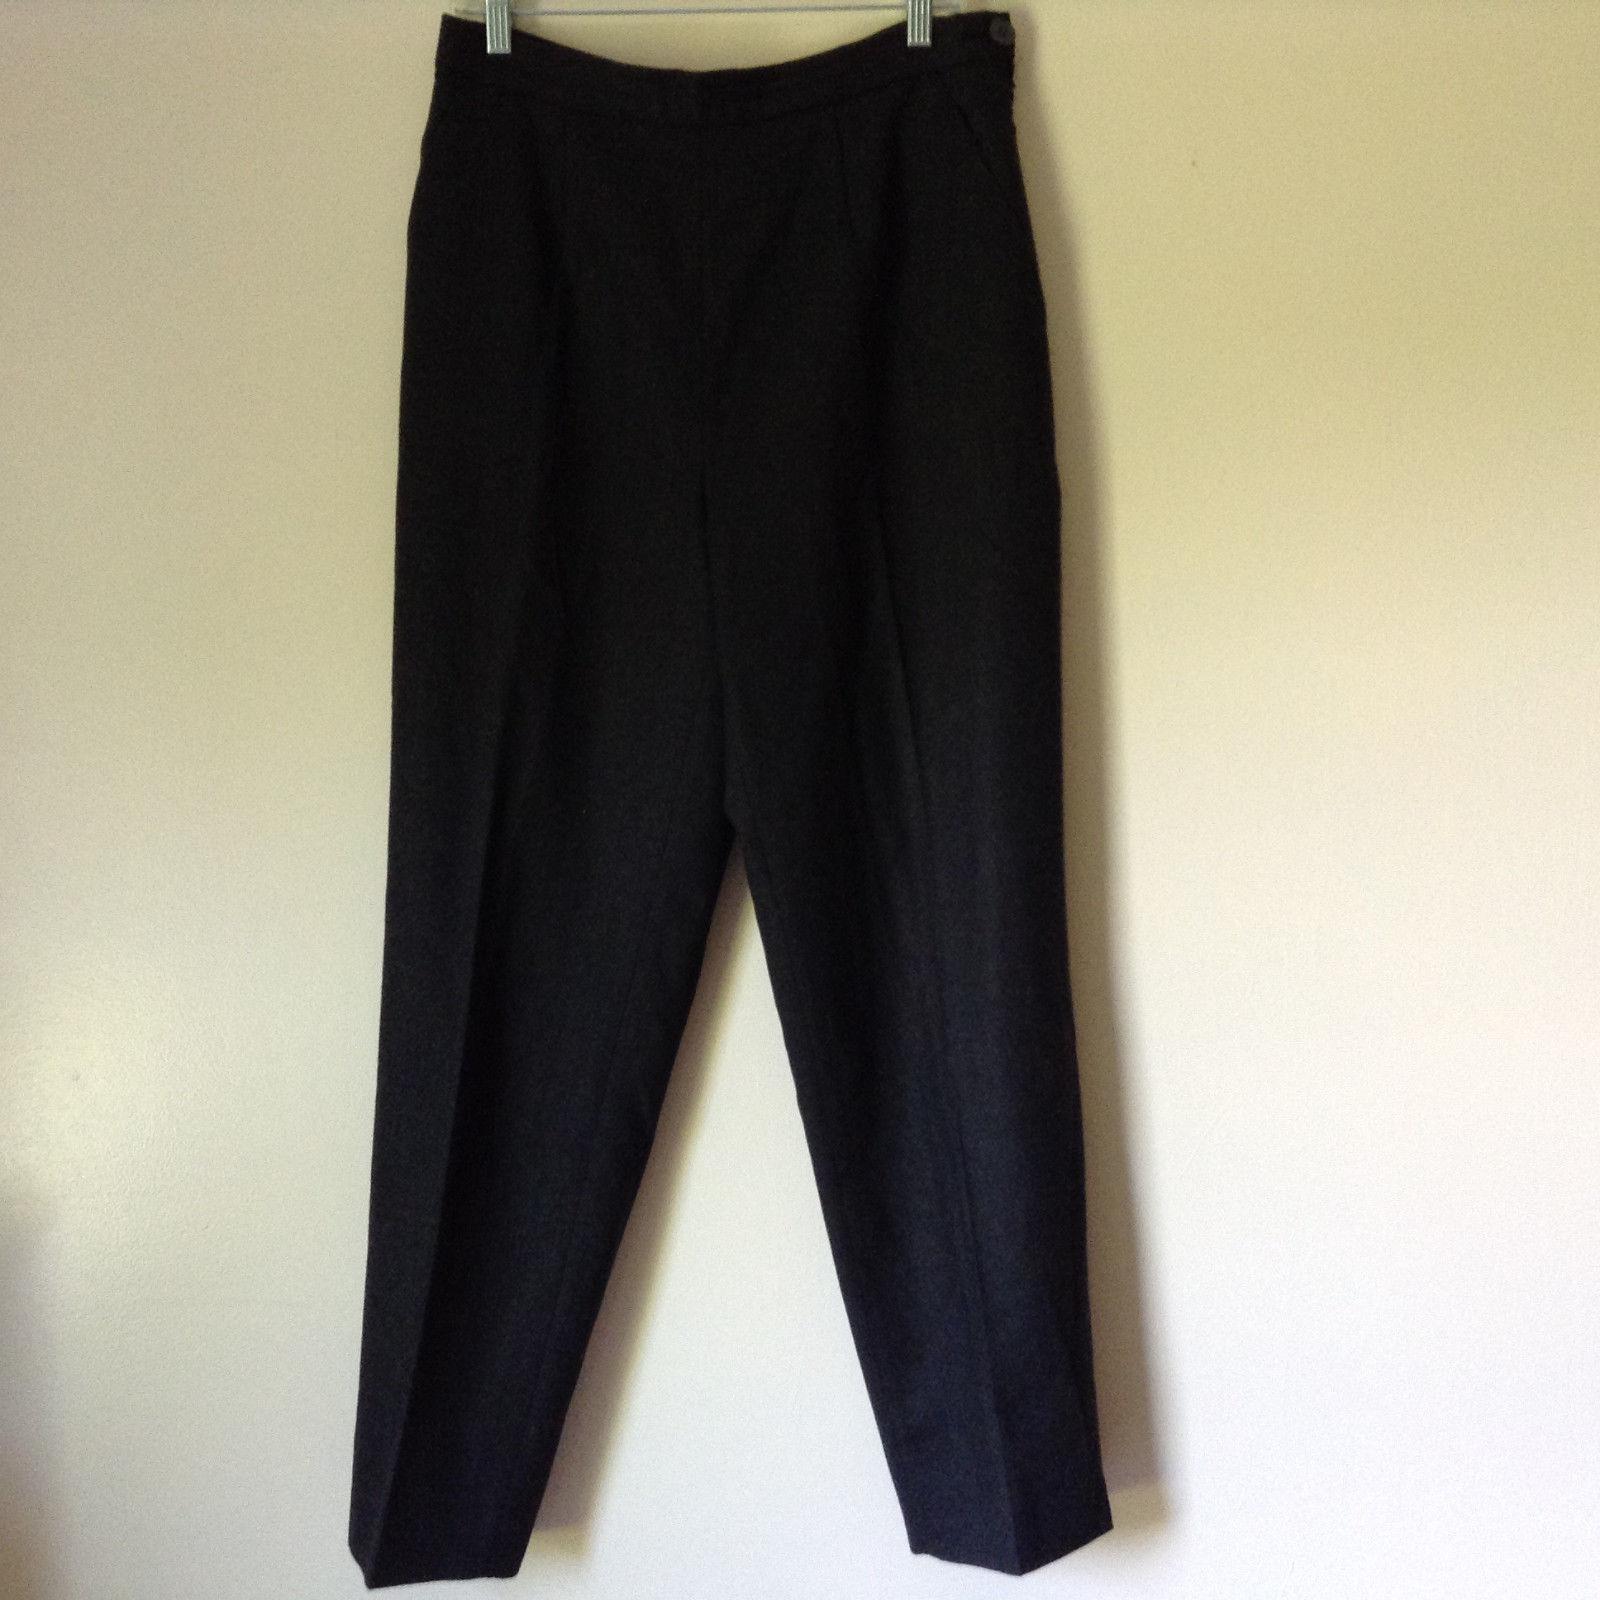 Dark Gray Dress Pants by Studio 0001 by Ferre Made in Italy Side Zipper Size 14